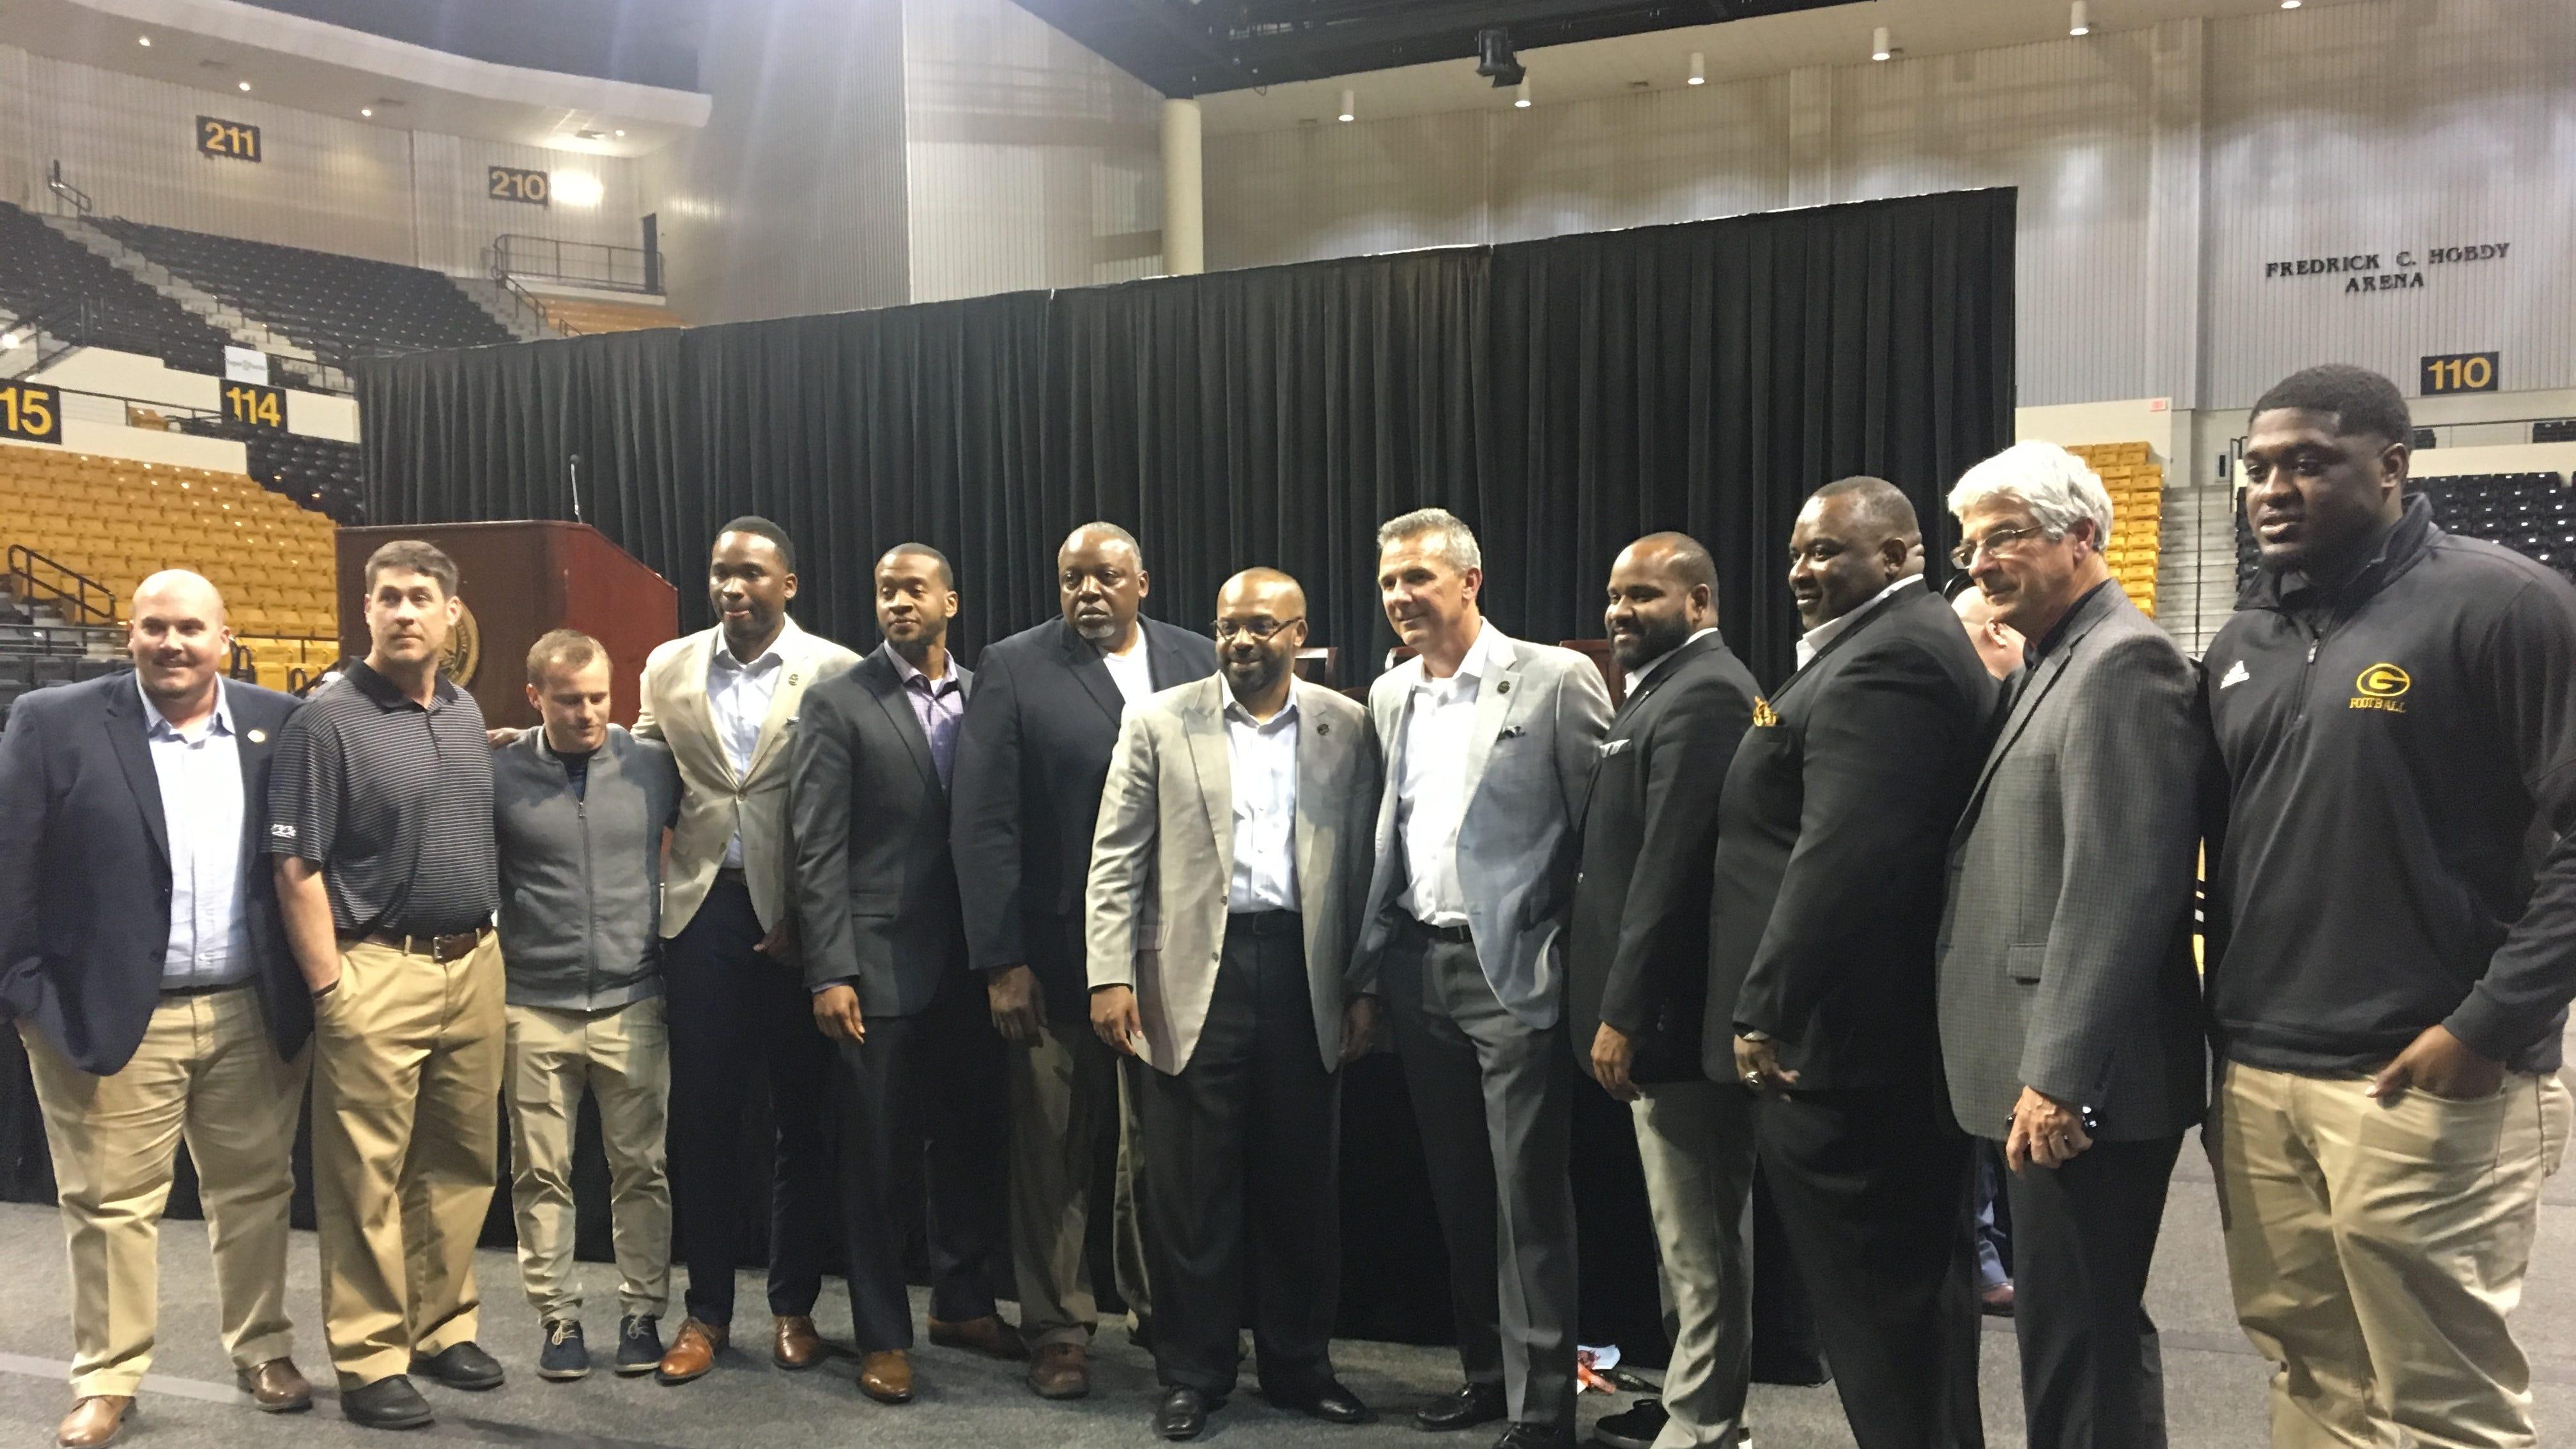 Fobbs, Grambling football program 'energized' after Urban Meyer visit